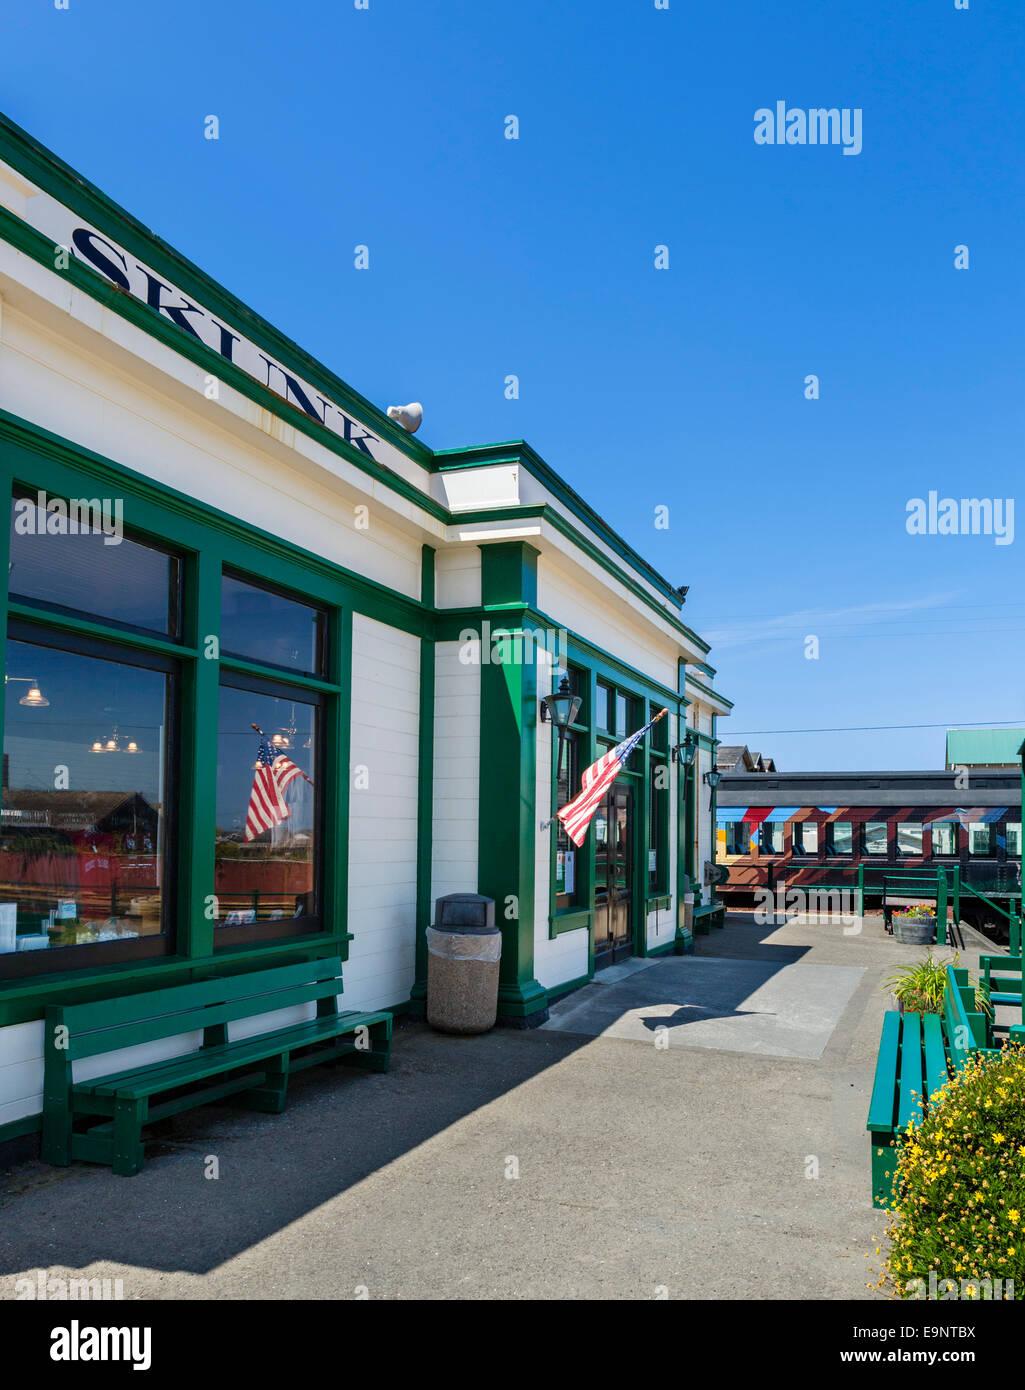 Skunk Train terminus in Fort Bragg, Mendocino, California, USA - Stock Image